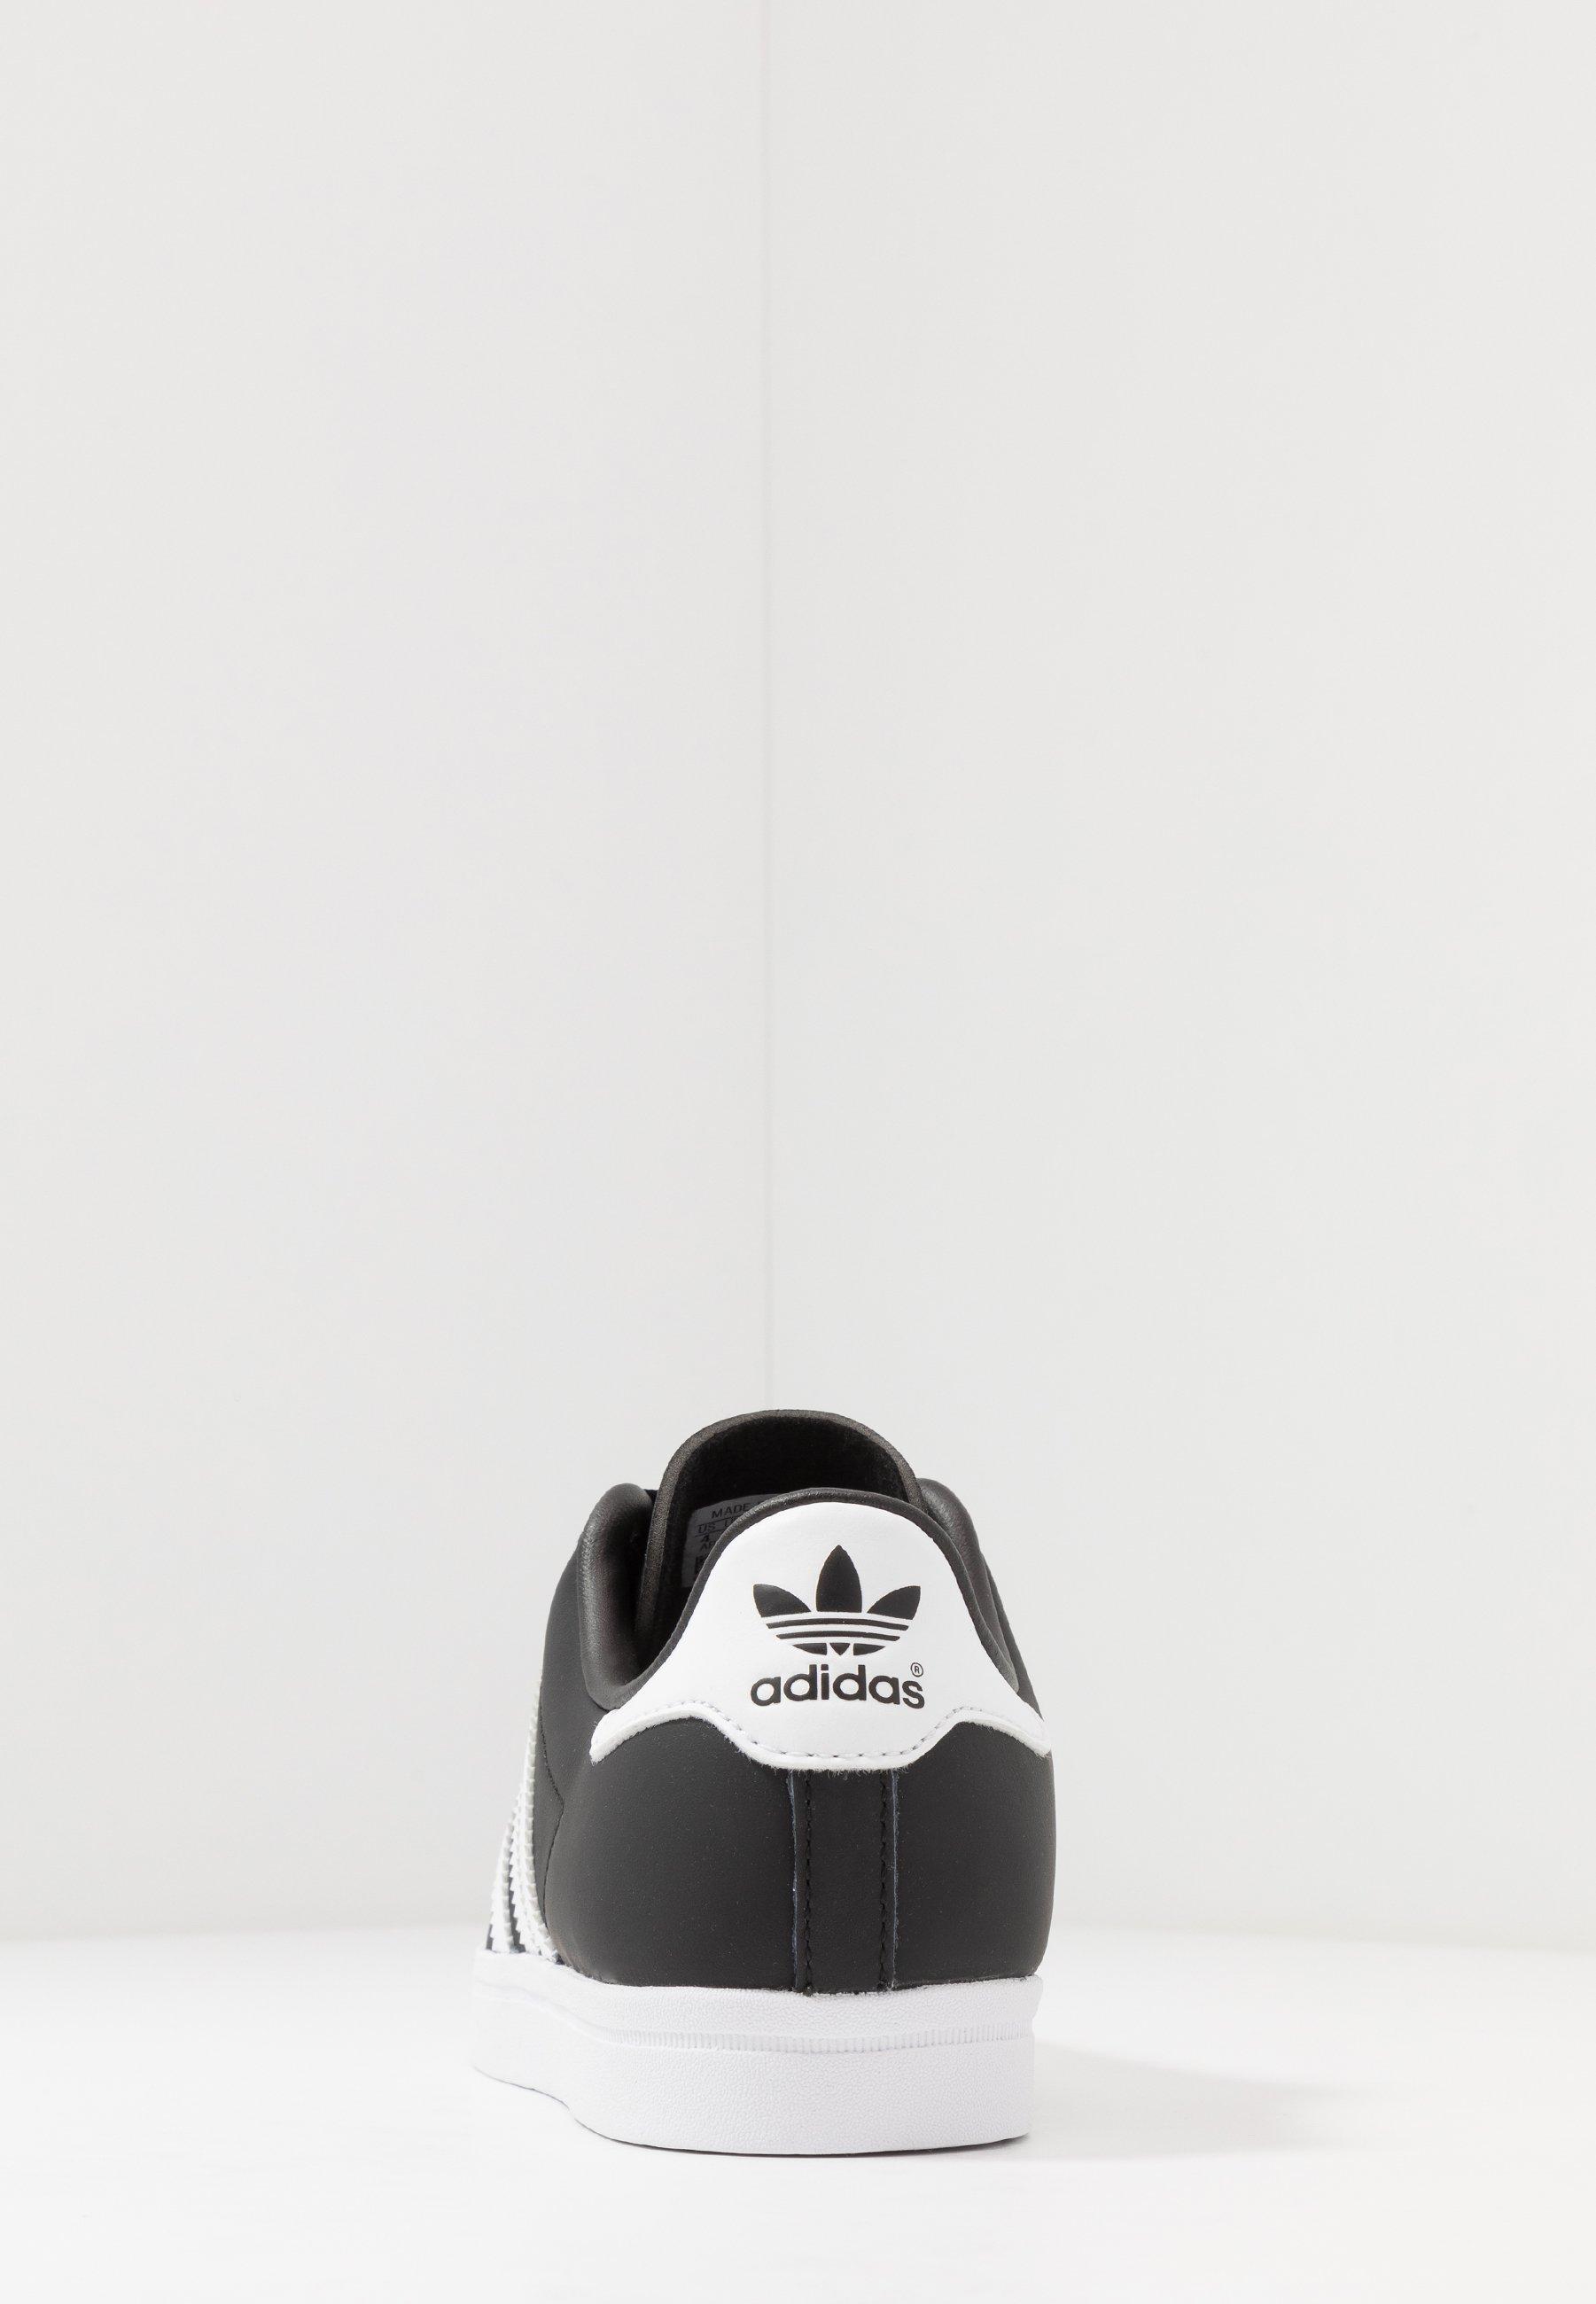 adidas Originals COAST STAR - Sneakers - cblack/ftwwht/cblack